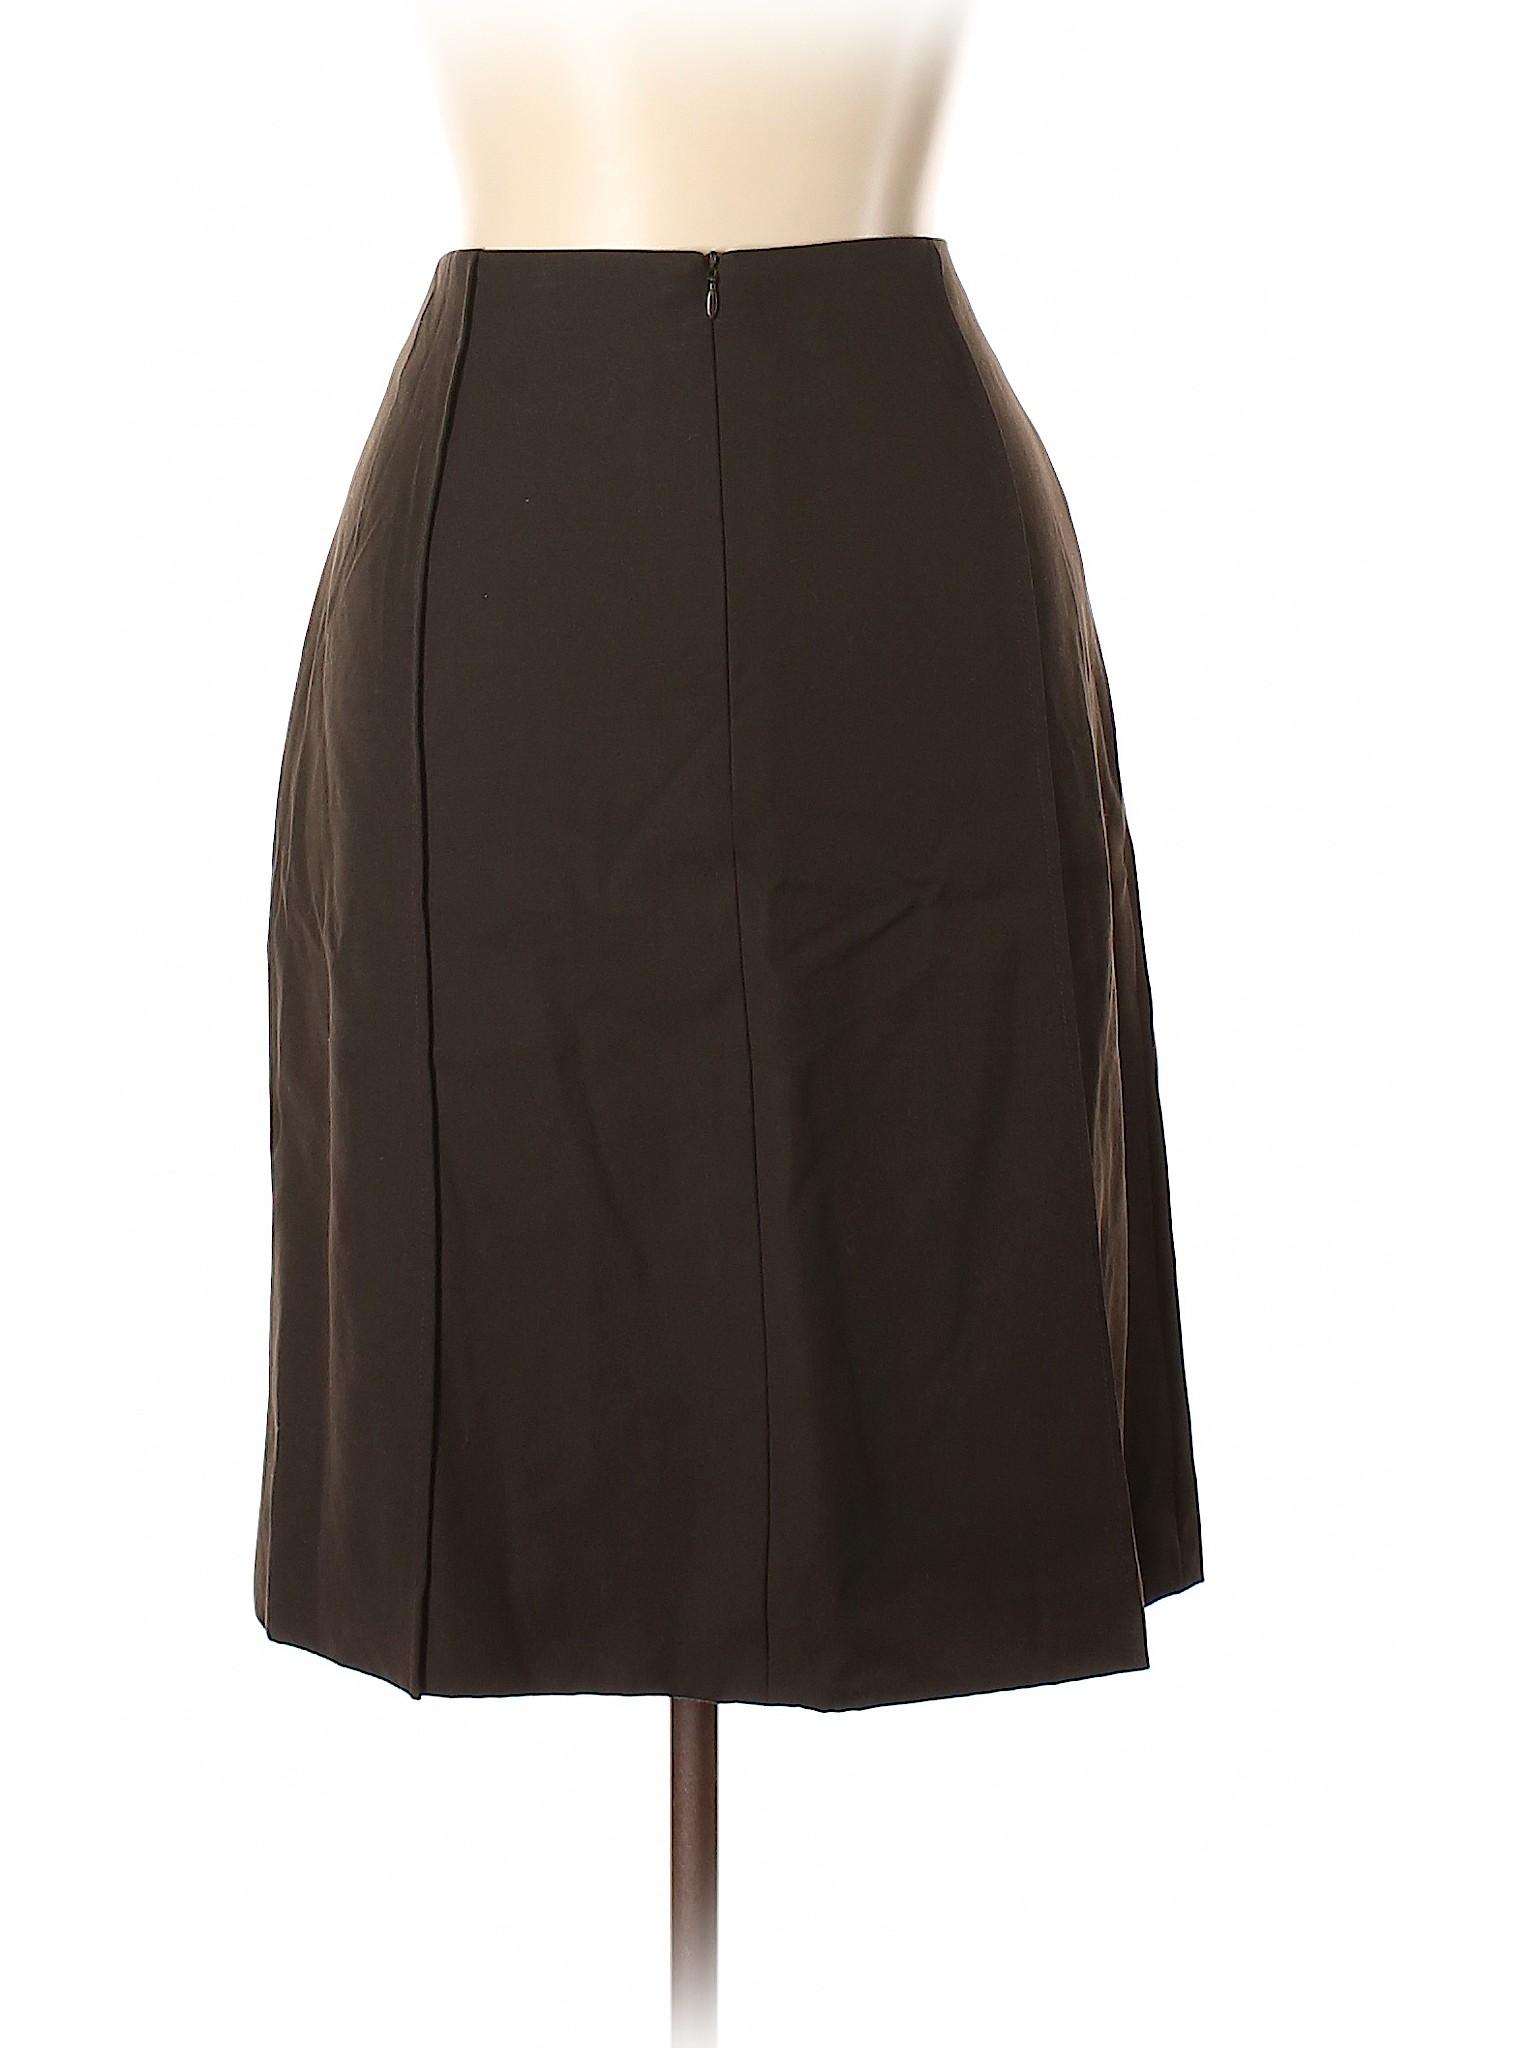 Skirt Skirt Boutique Wool Boutique Wool Boutique Wool Wool Skirt Boutique Skirt HPYt1